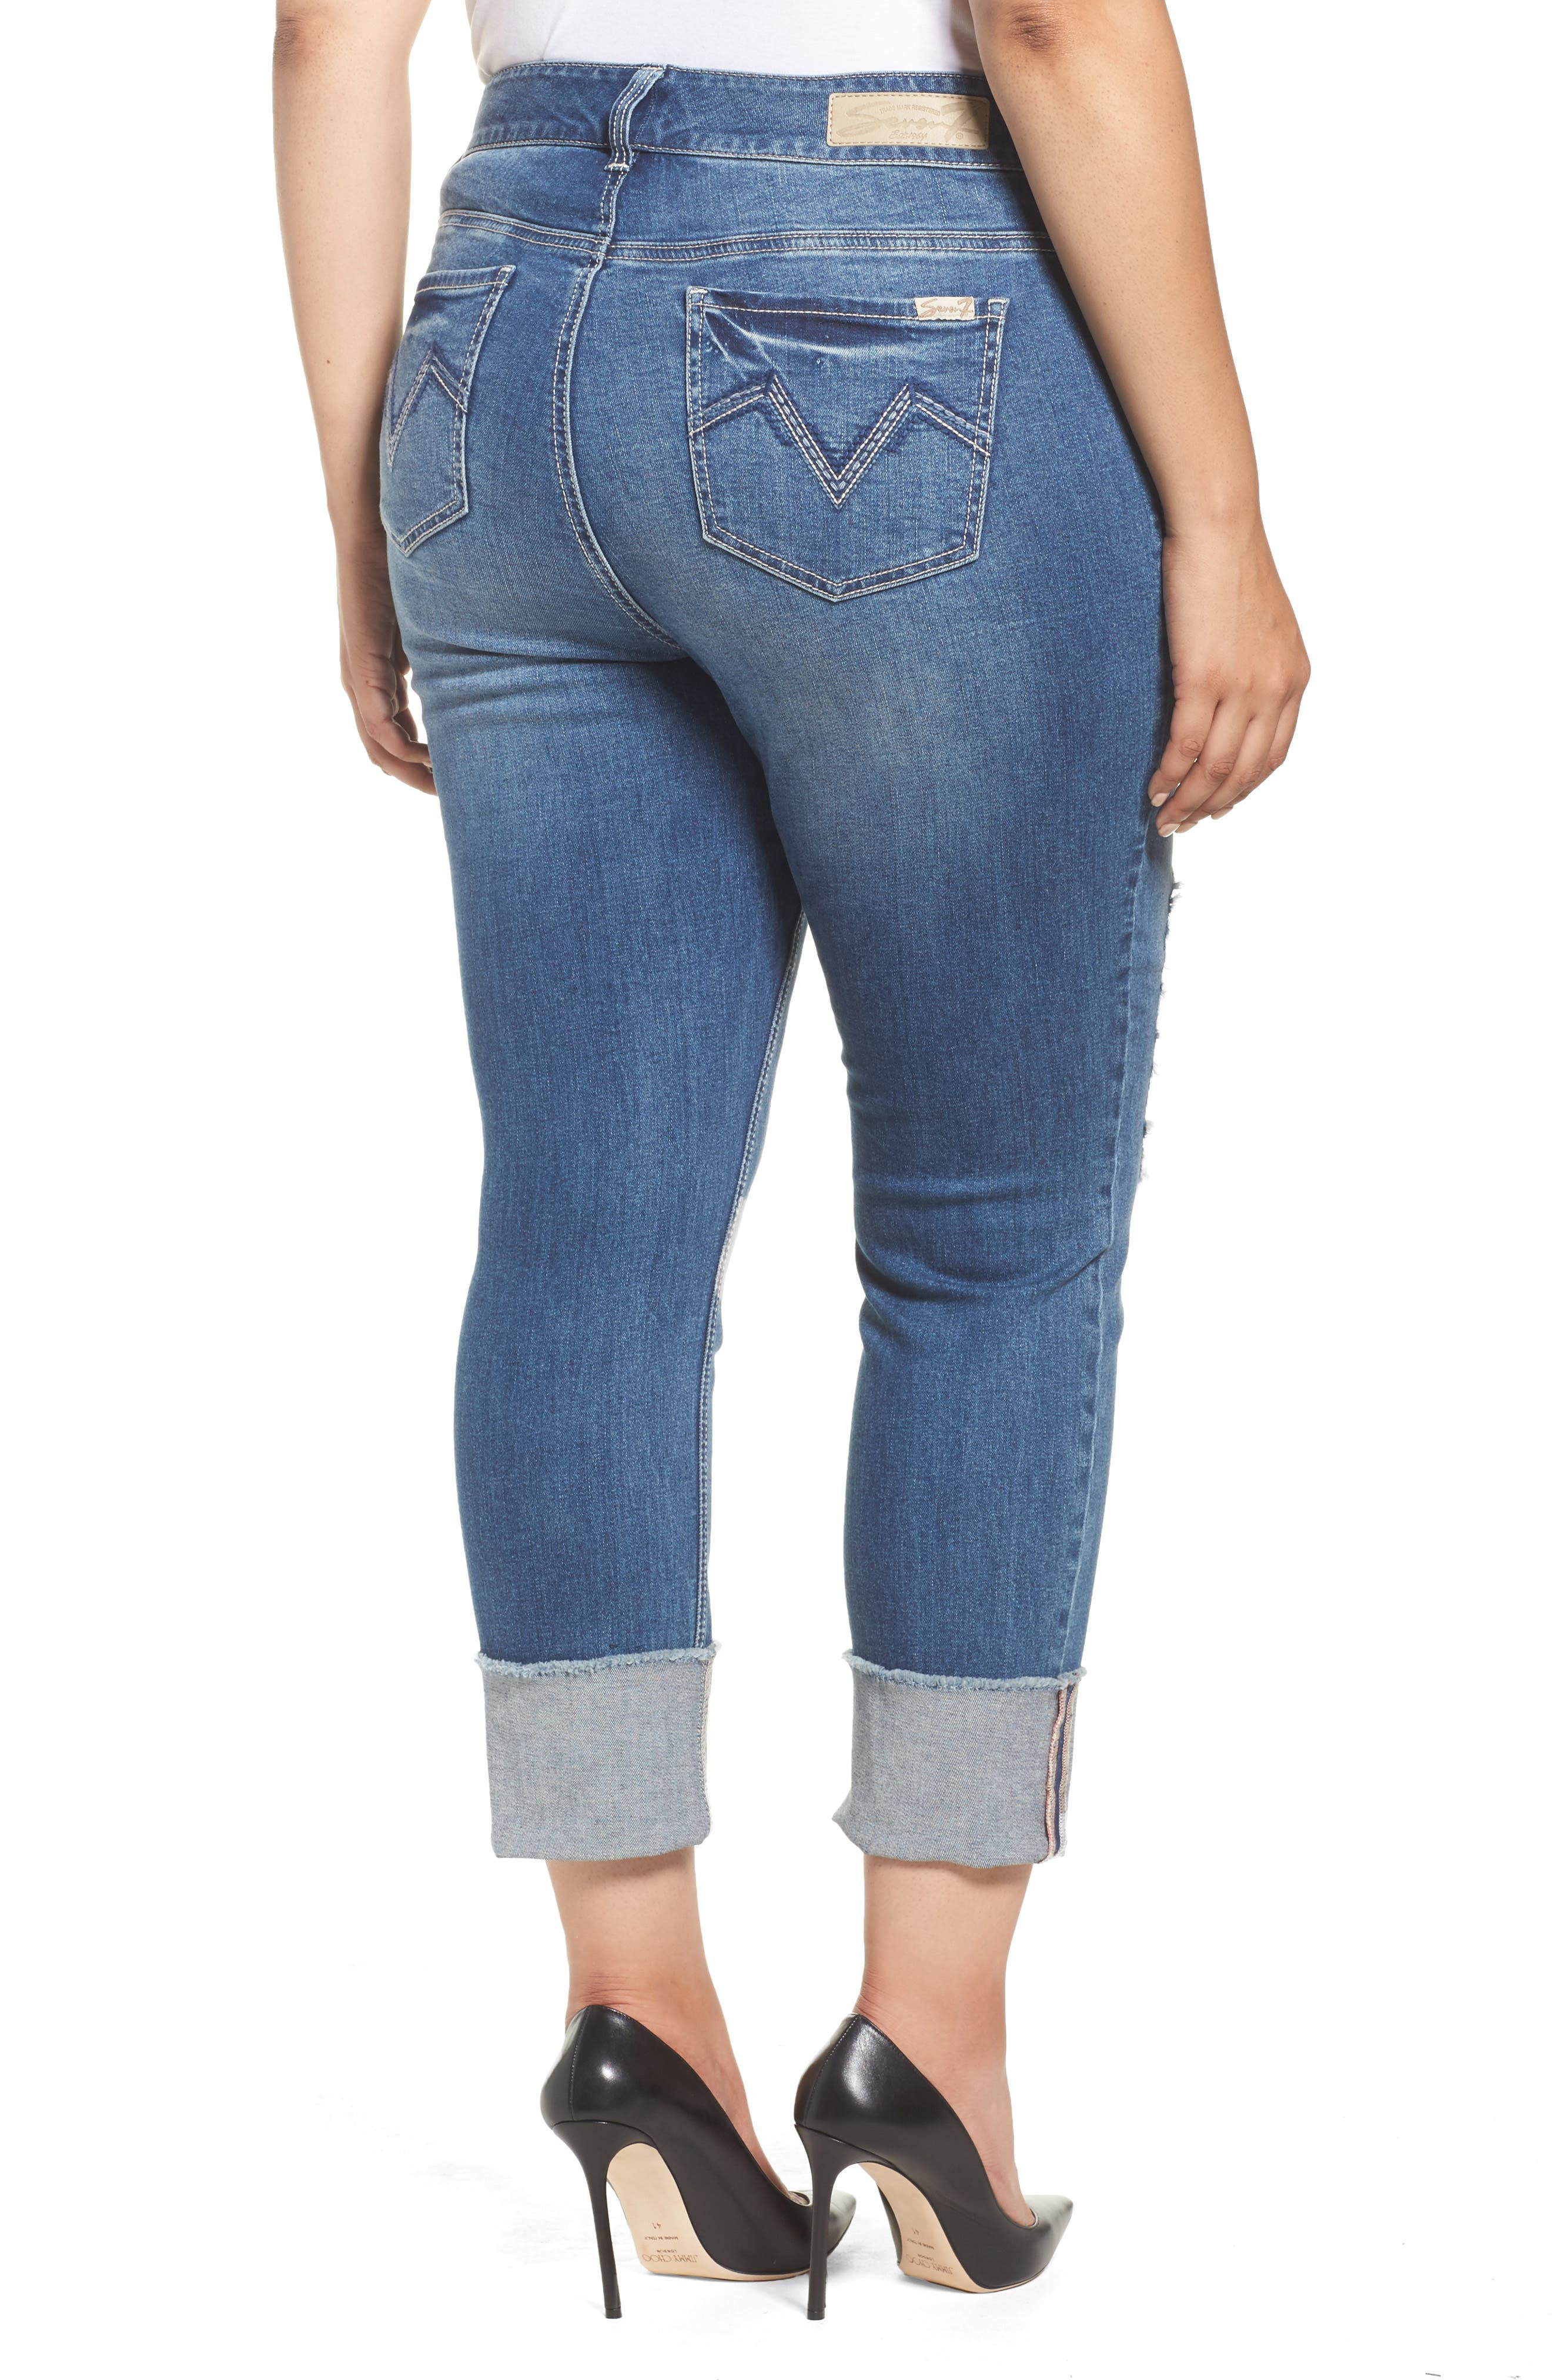 Alternate Image 2  - Seven7 Distressed Slim Raw Hem Cuffed Jeans (Concorde) (Plus Size)